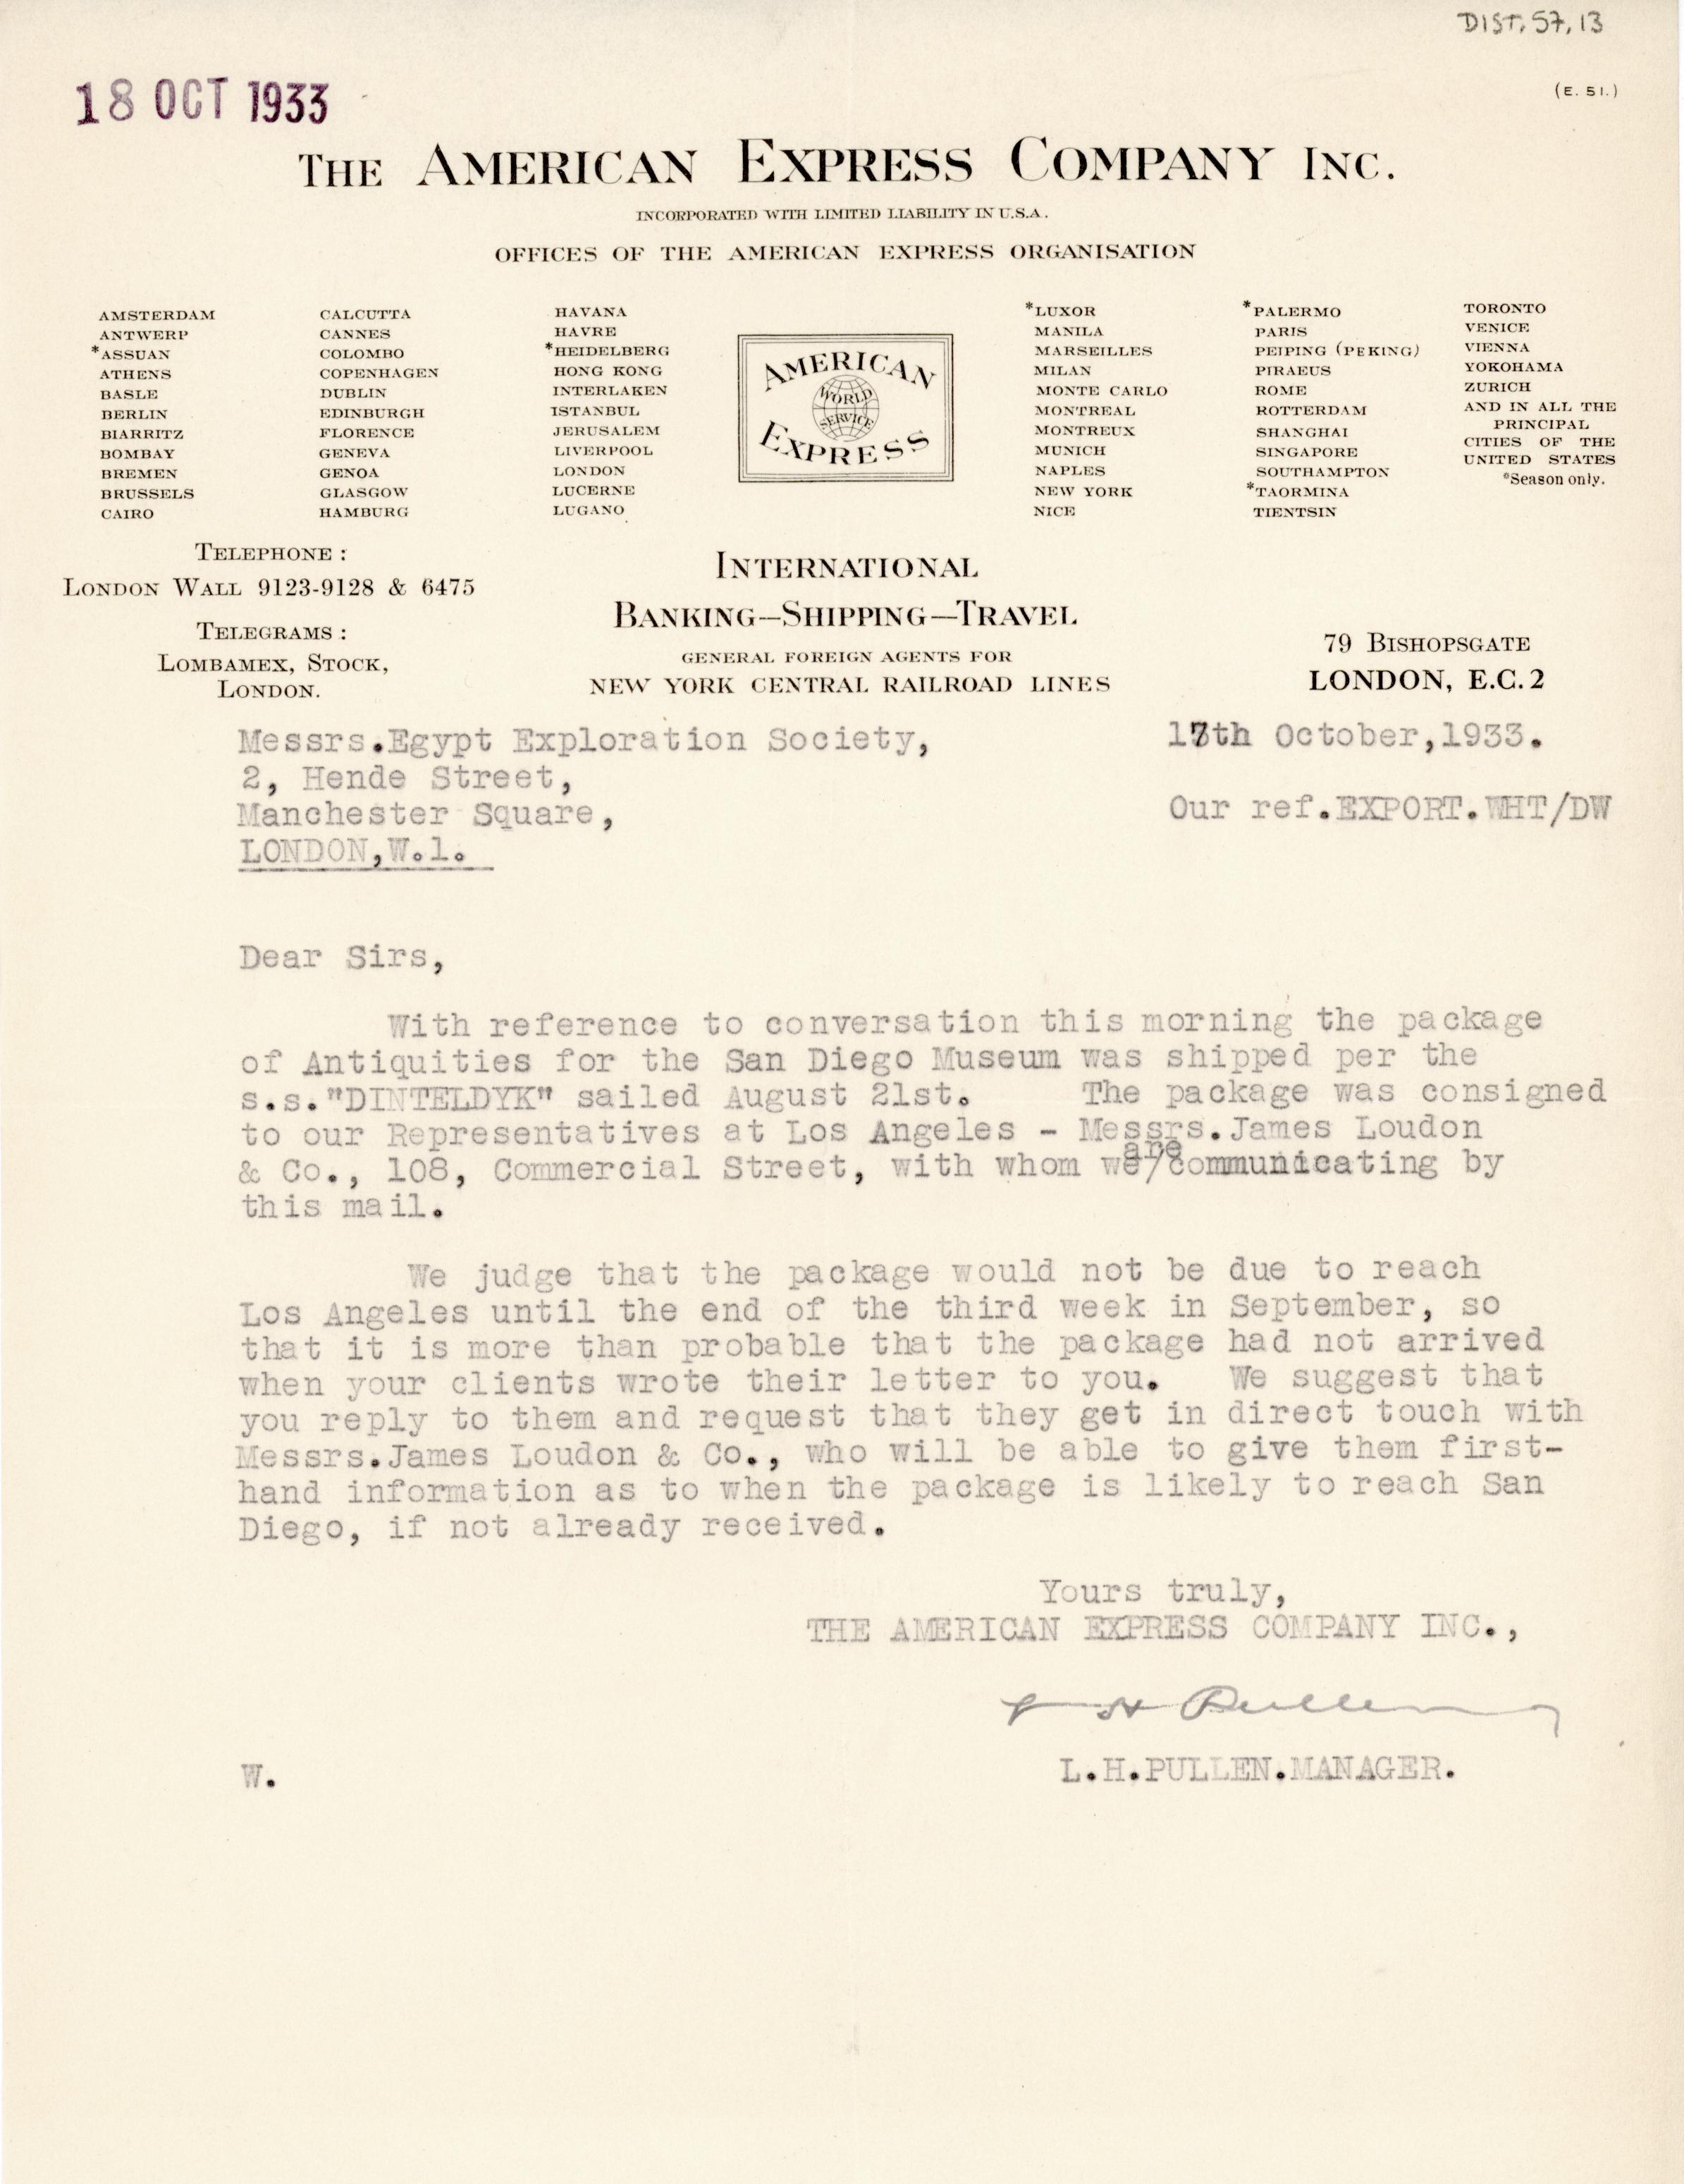 1931-34 el-Amarna DIST.57.13